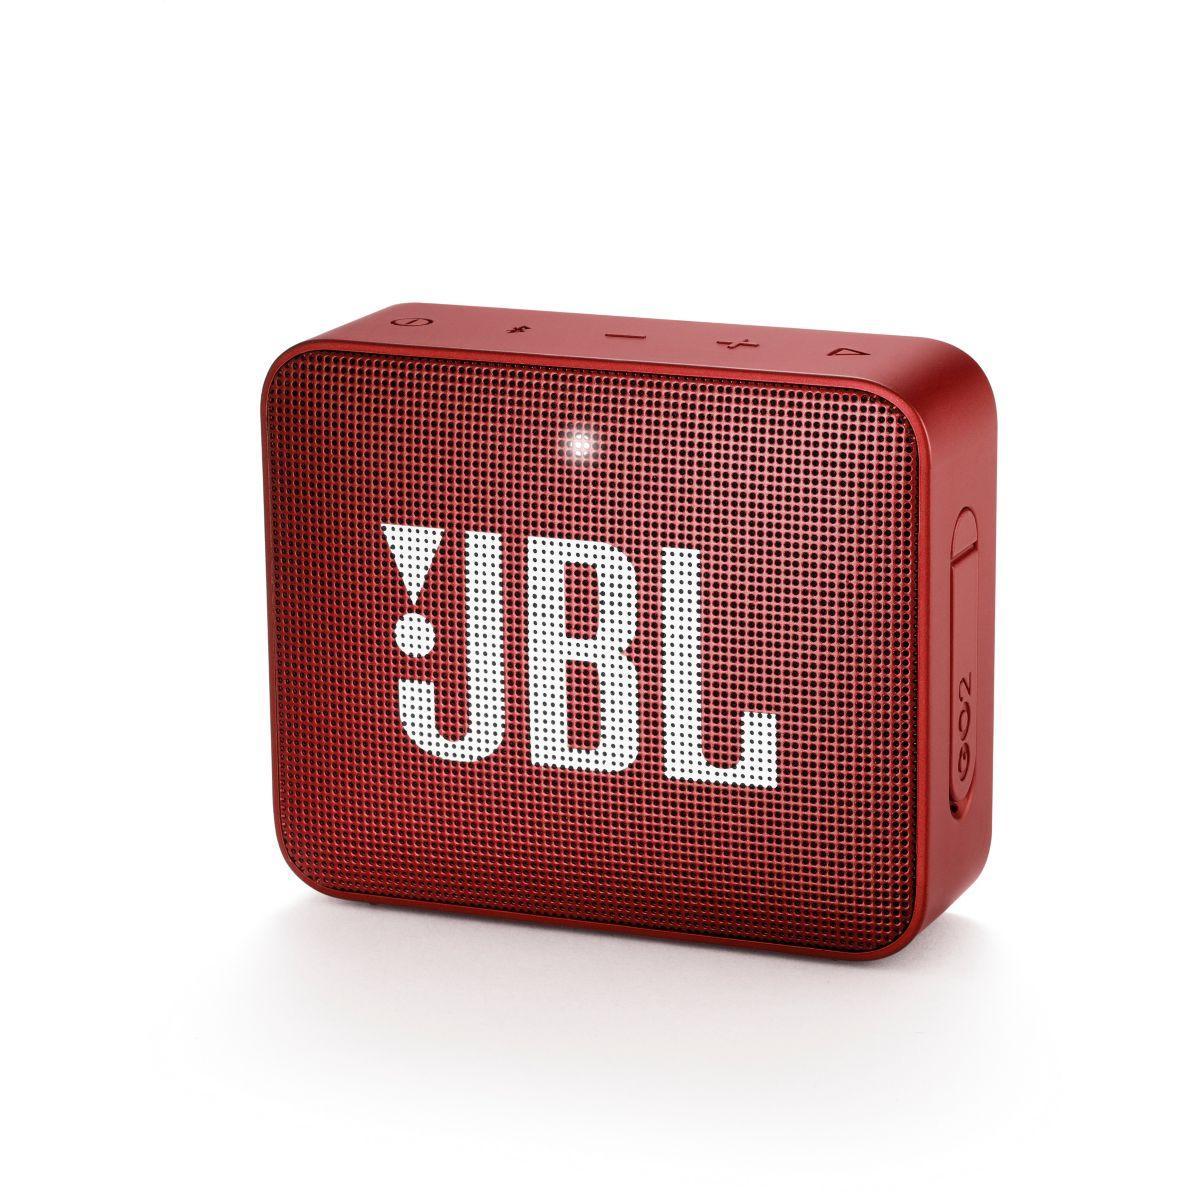 Enceinte bluetooth jbl go 2 rouge (photo)